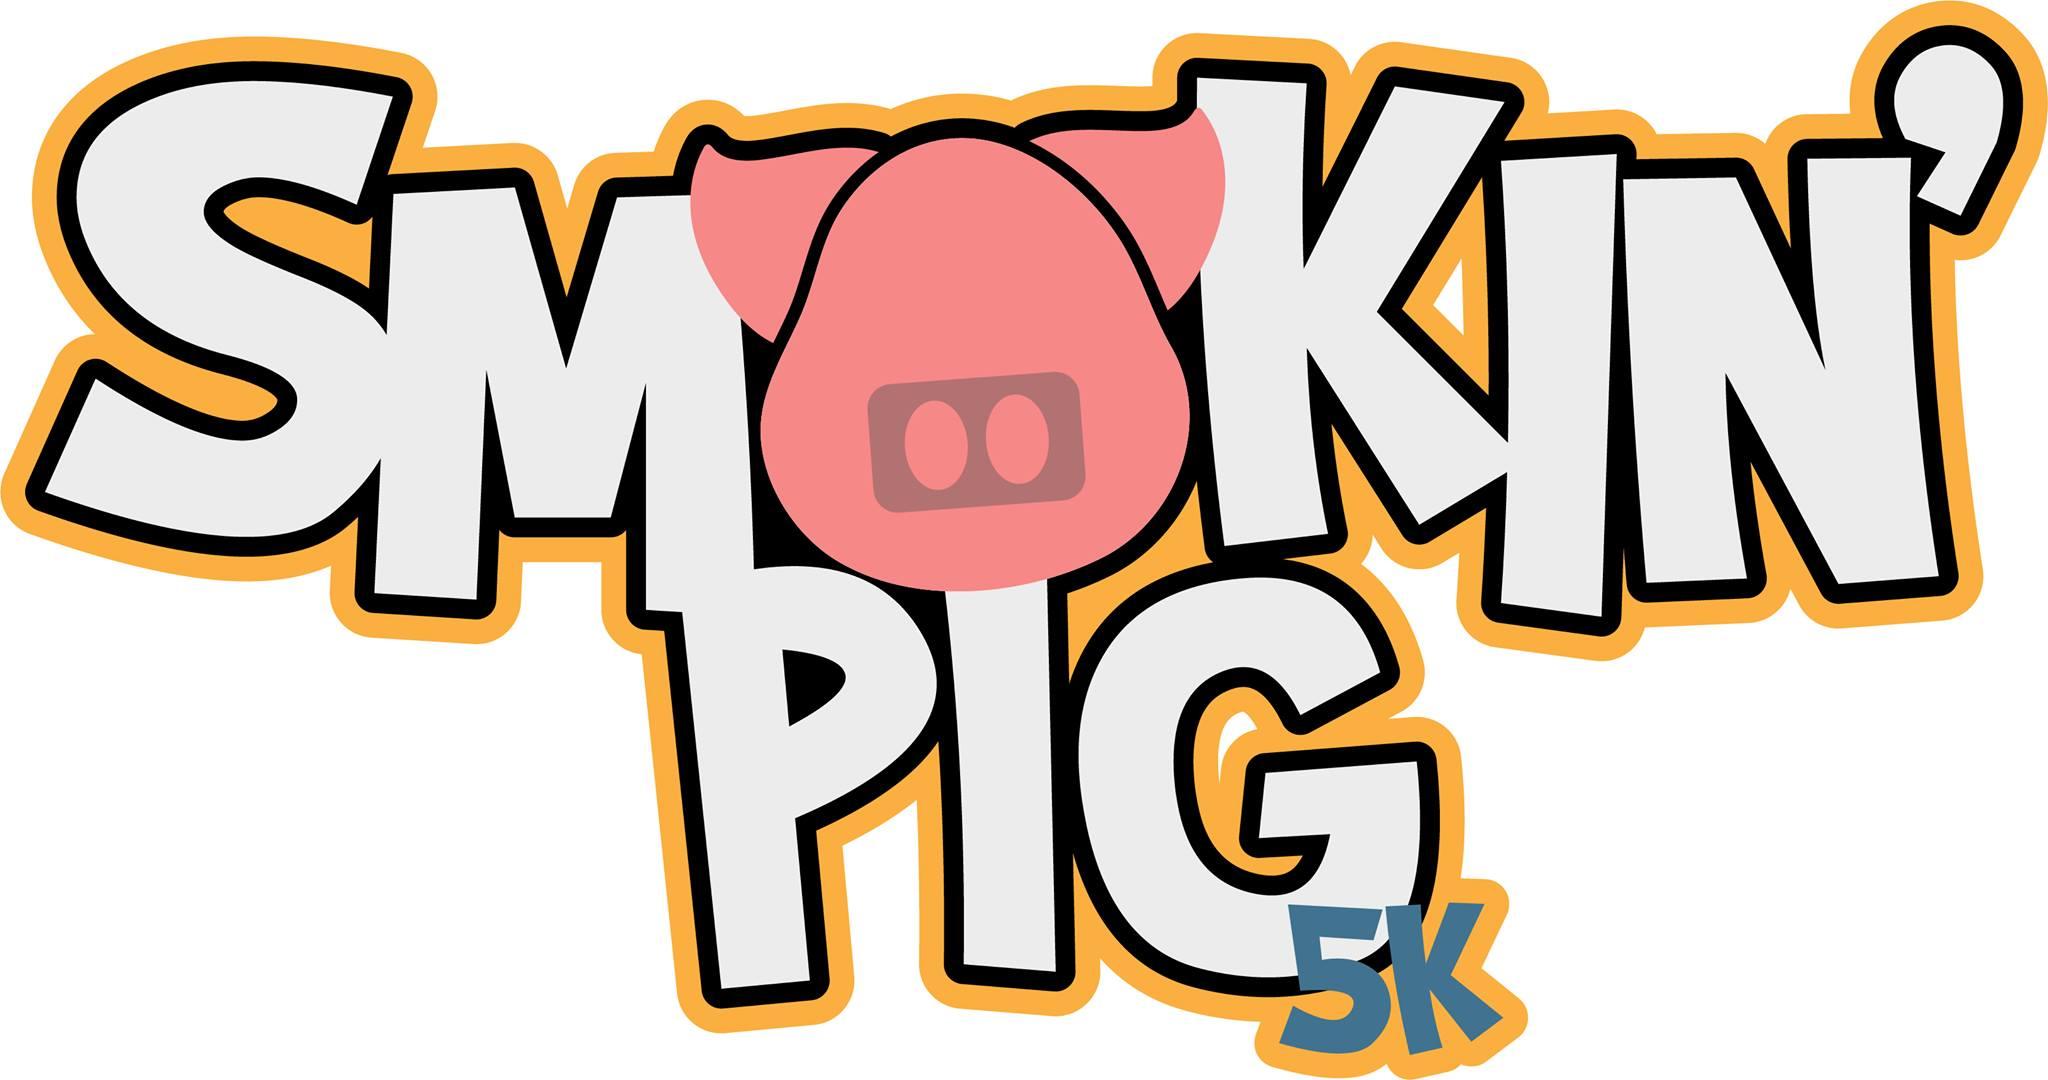 Smokin' Pig 5K